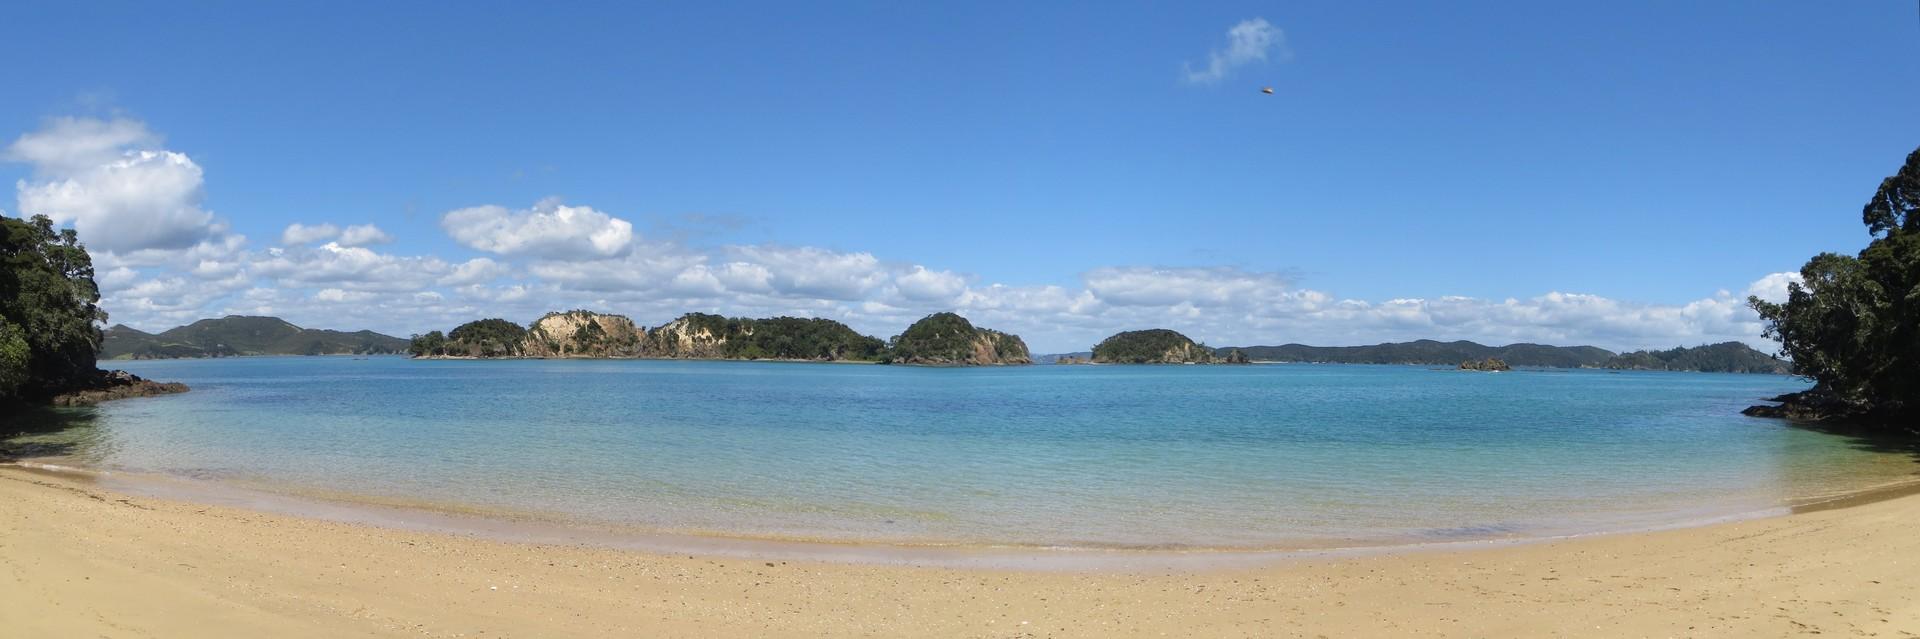 2013.02.10_bay_of_island02